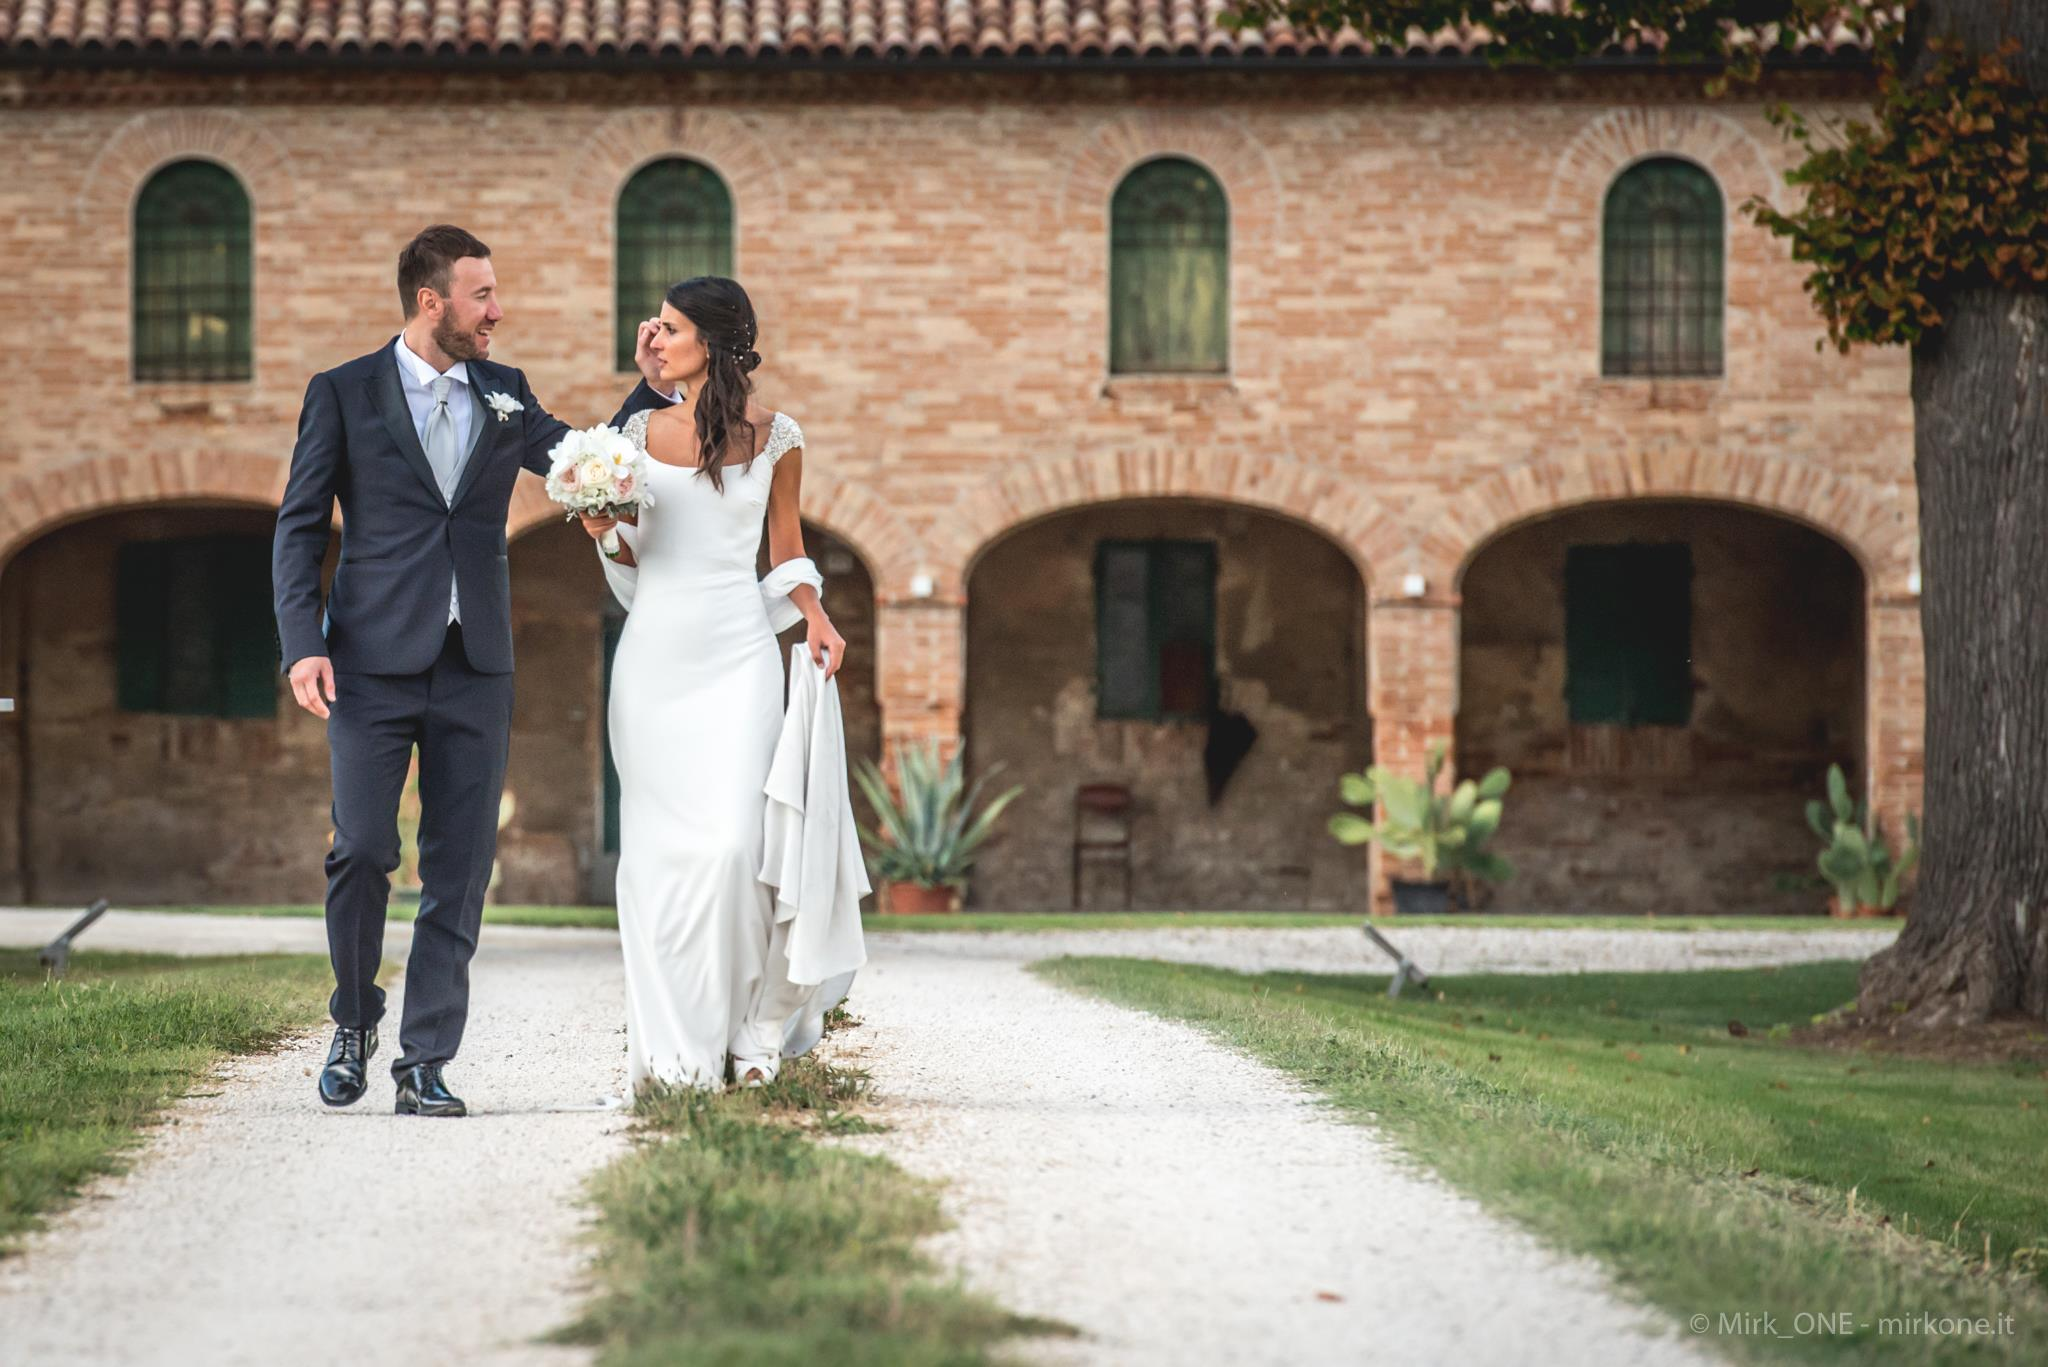 https://lnx.mirkone.it/wp-content/uploads/2015/07/mirk_ONE-fotografo-matrimonio-00119.jpg